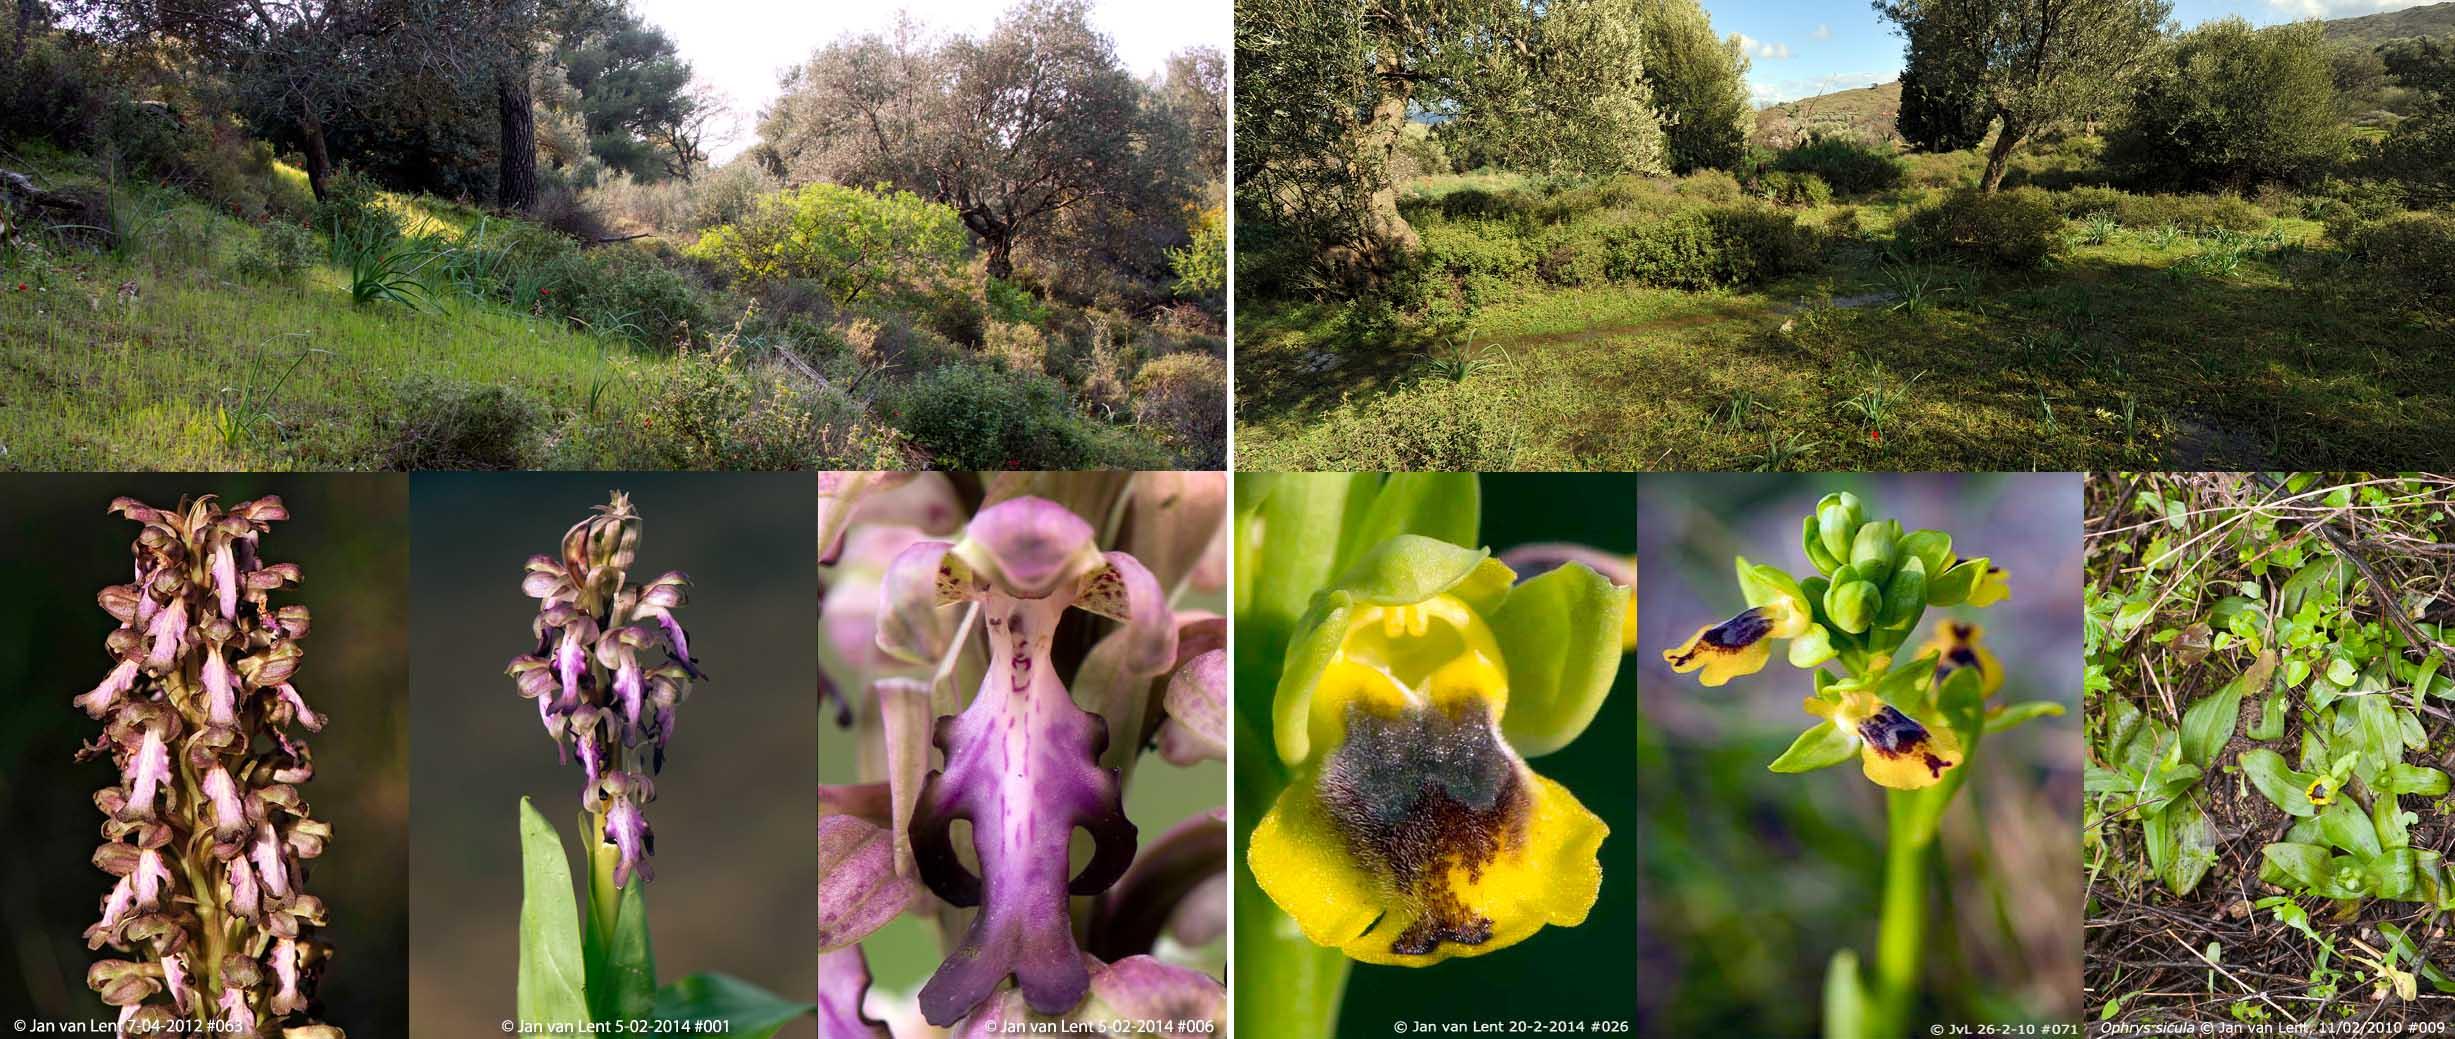 H.robertianum & Oph.sicula, Eftalou-2 86,62x36,66